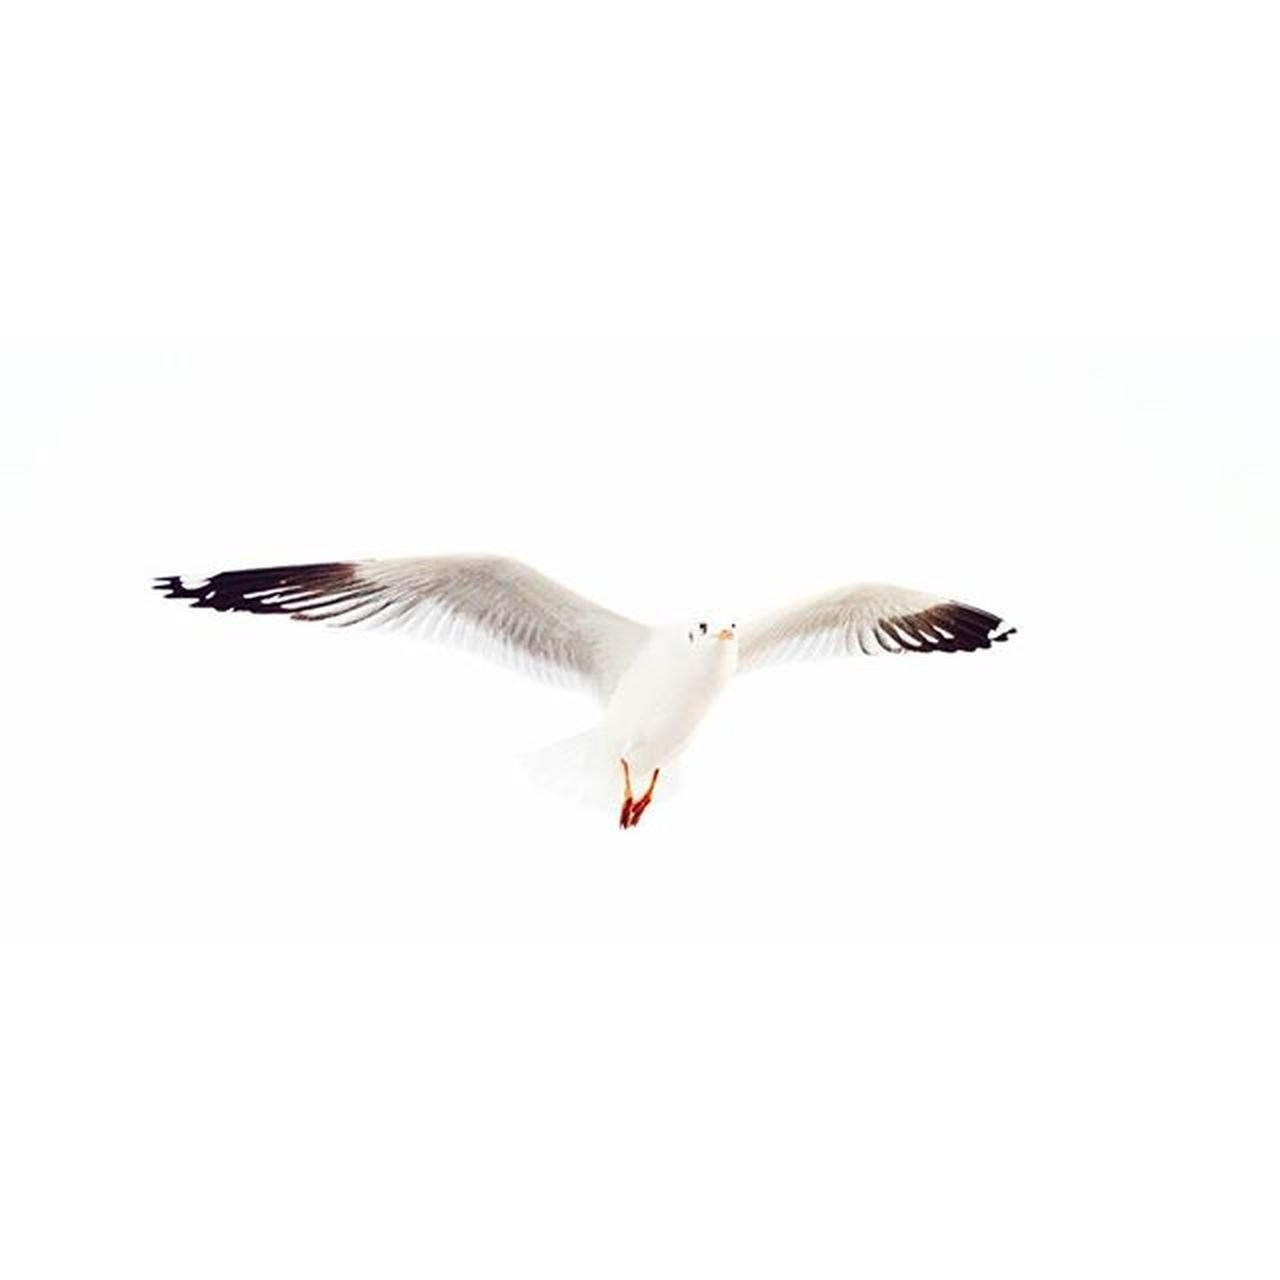 Day 7 Free as a bird Location - Ferry ride from Elephanta Caves, Mumbai, India IndiaJourney Bird Free Freedom India Vscocam VSCO Vscobirds India Birds White Ferryride Vscotravel Vscoexplore Fly Sky High Flying Flyingbird